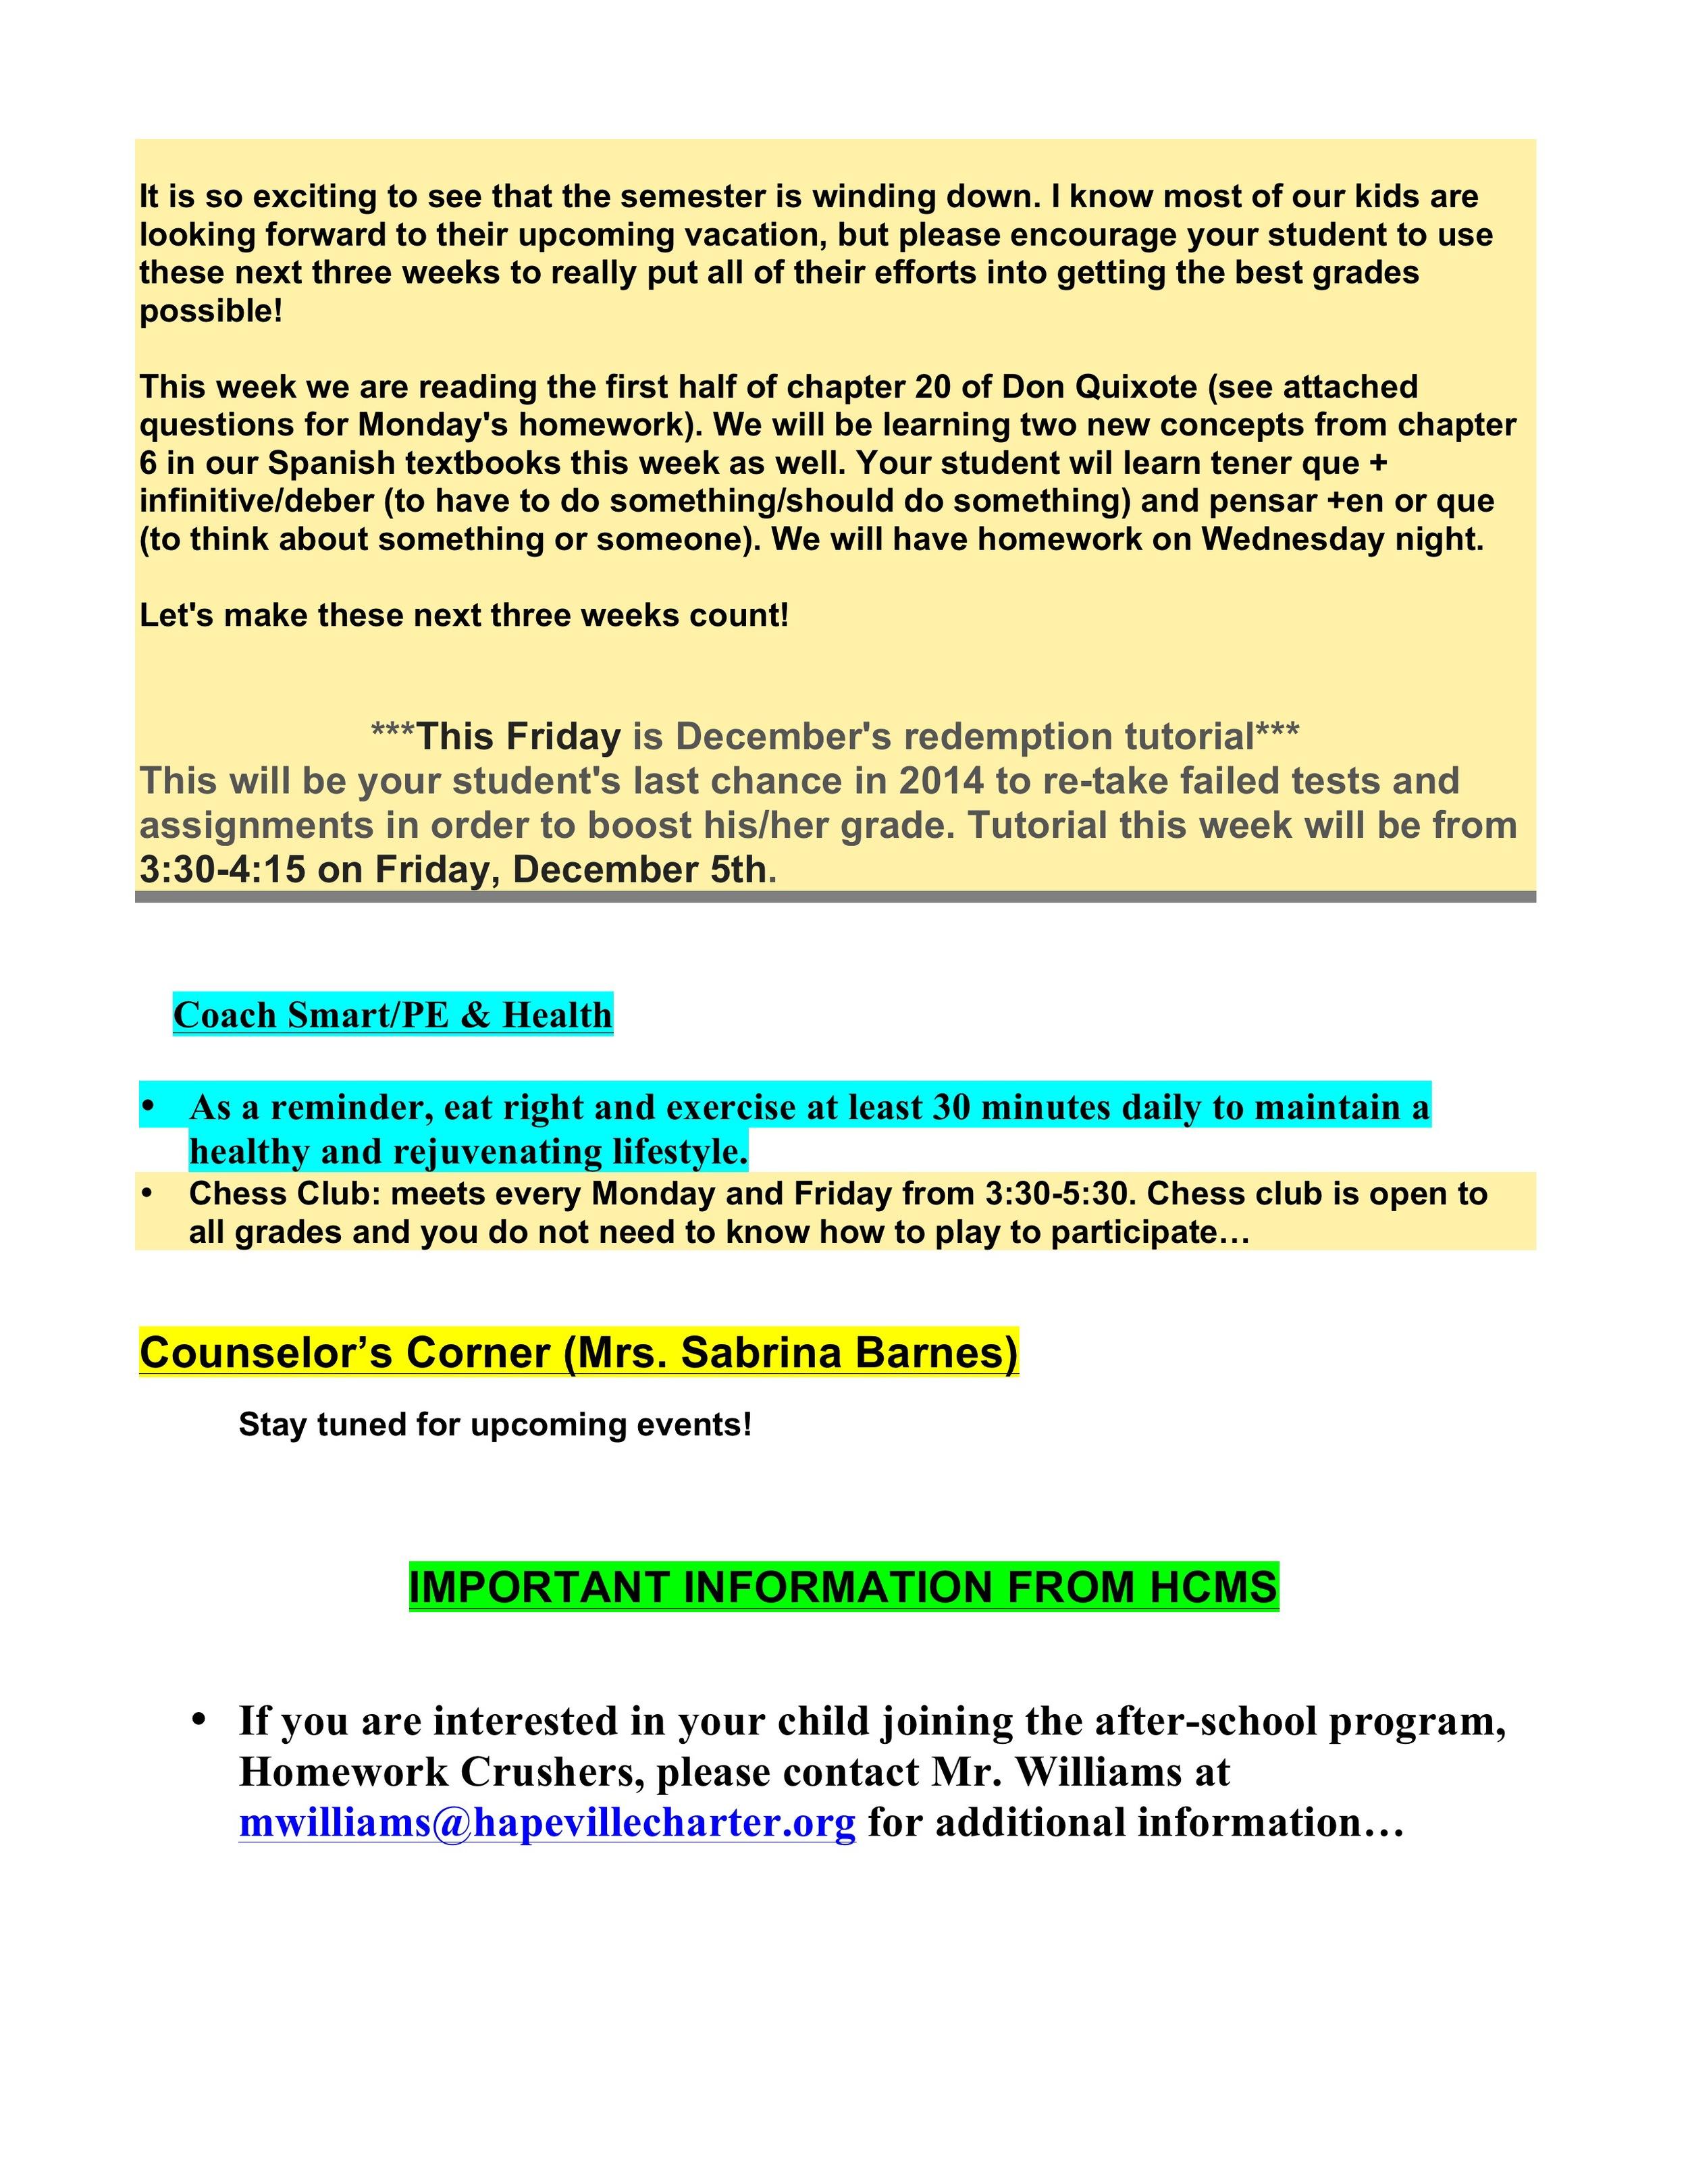 Newsletter Image7th Grade December 1 5.jpeg